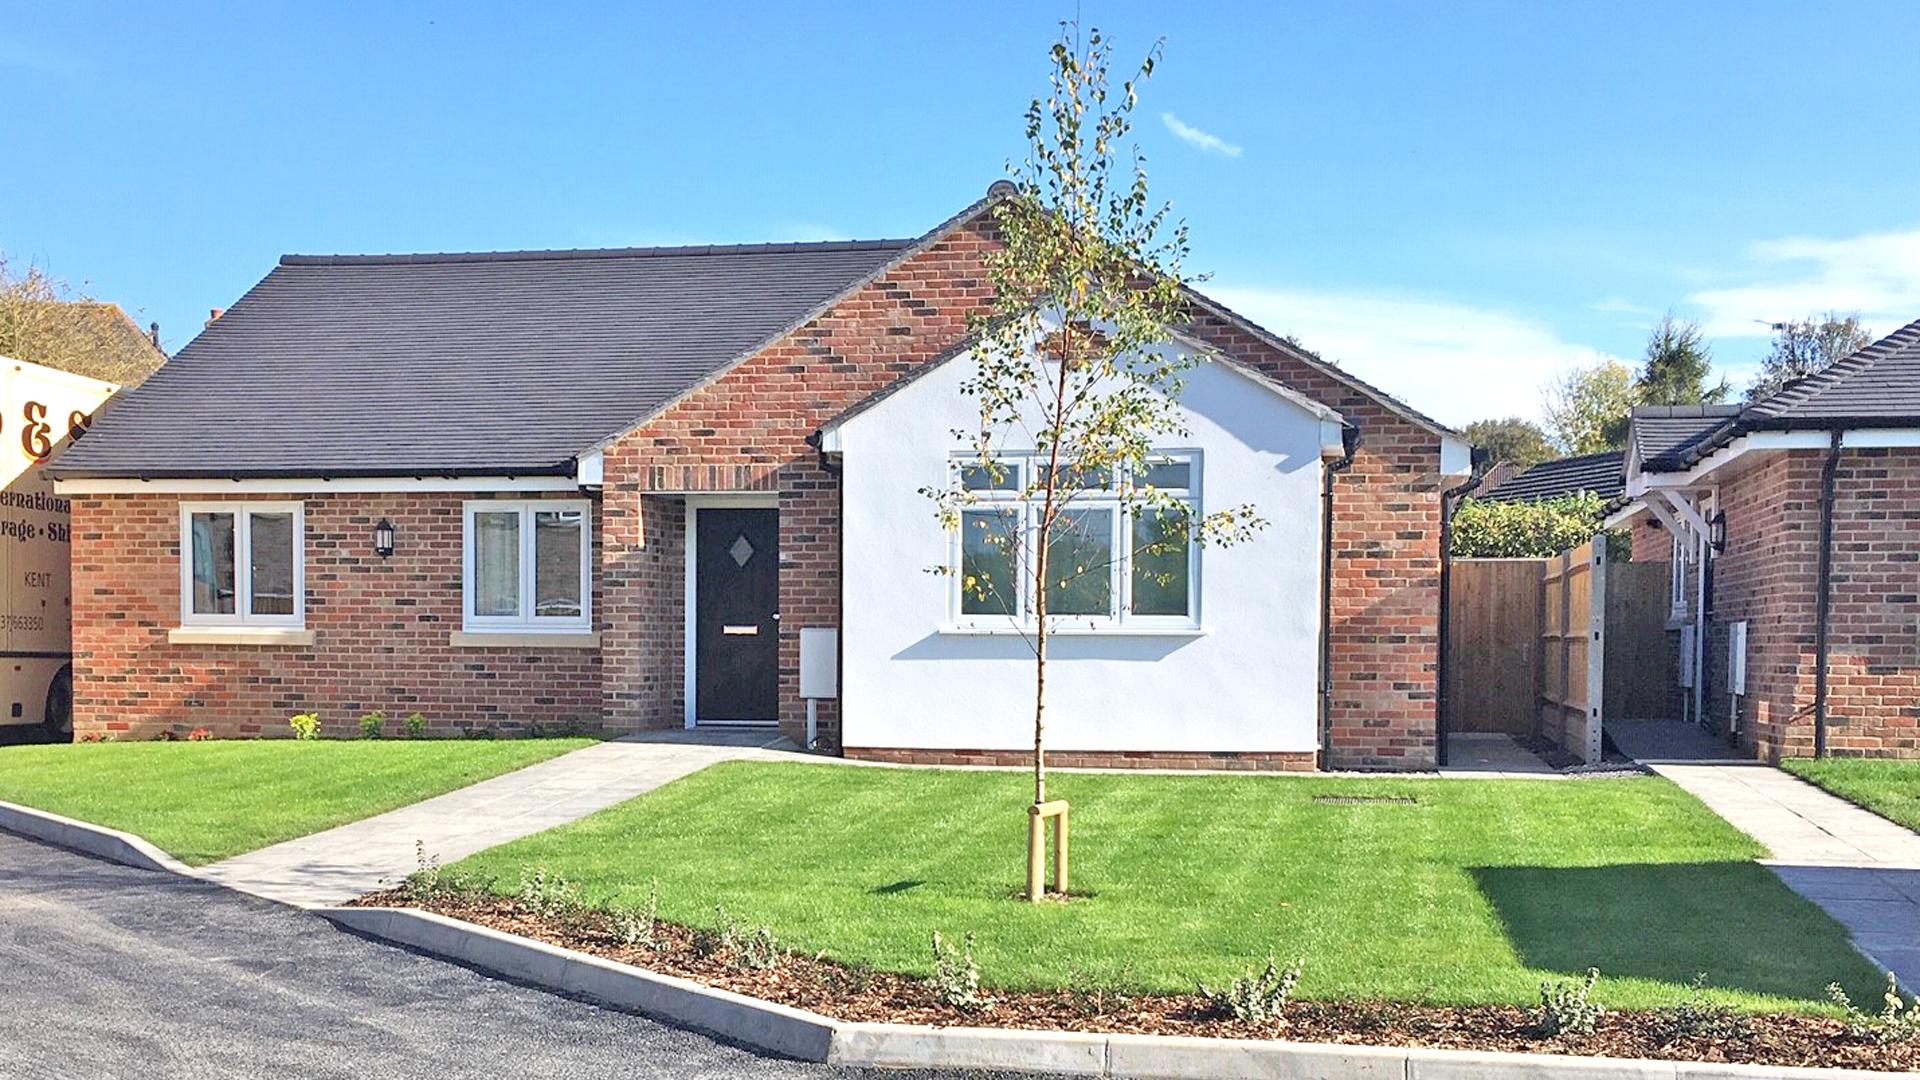 A new build bungalow at our Churchfields development.